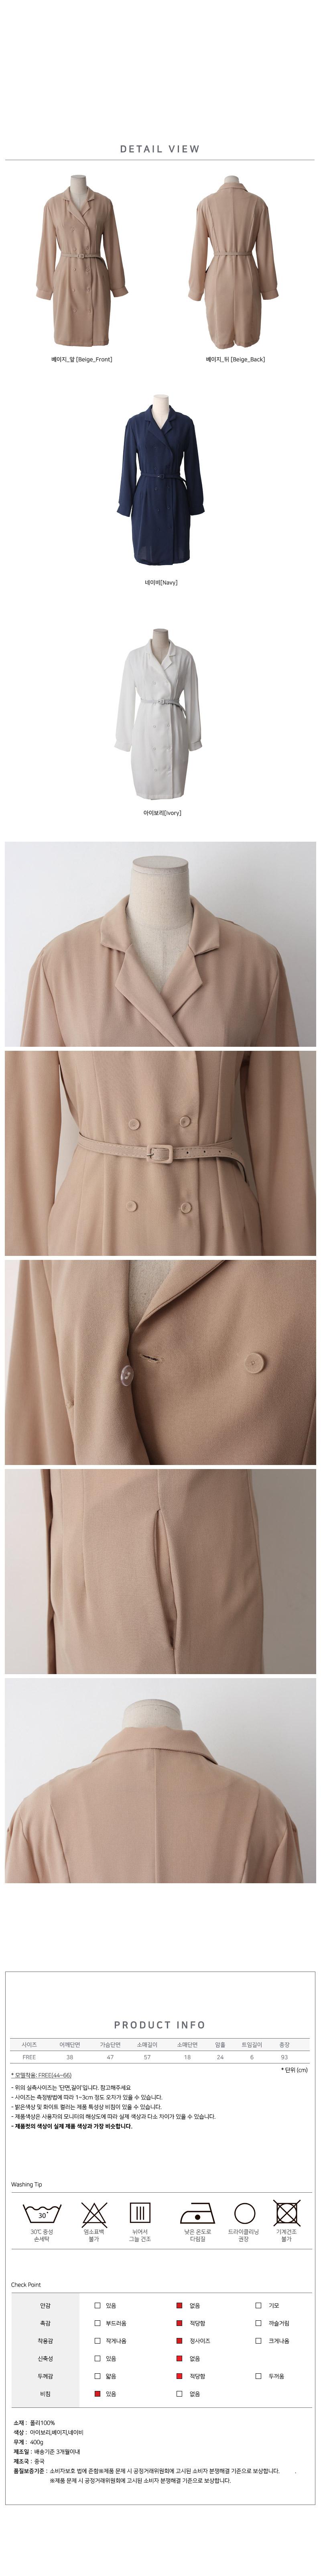 Double Puff Dress Jacket